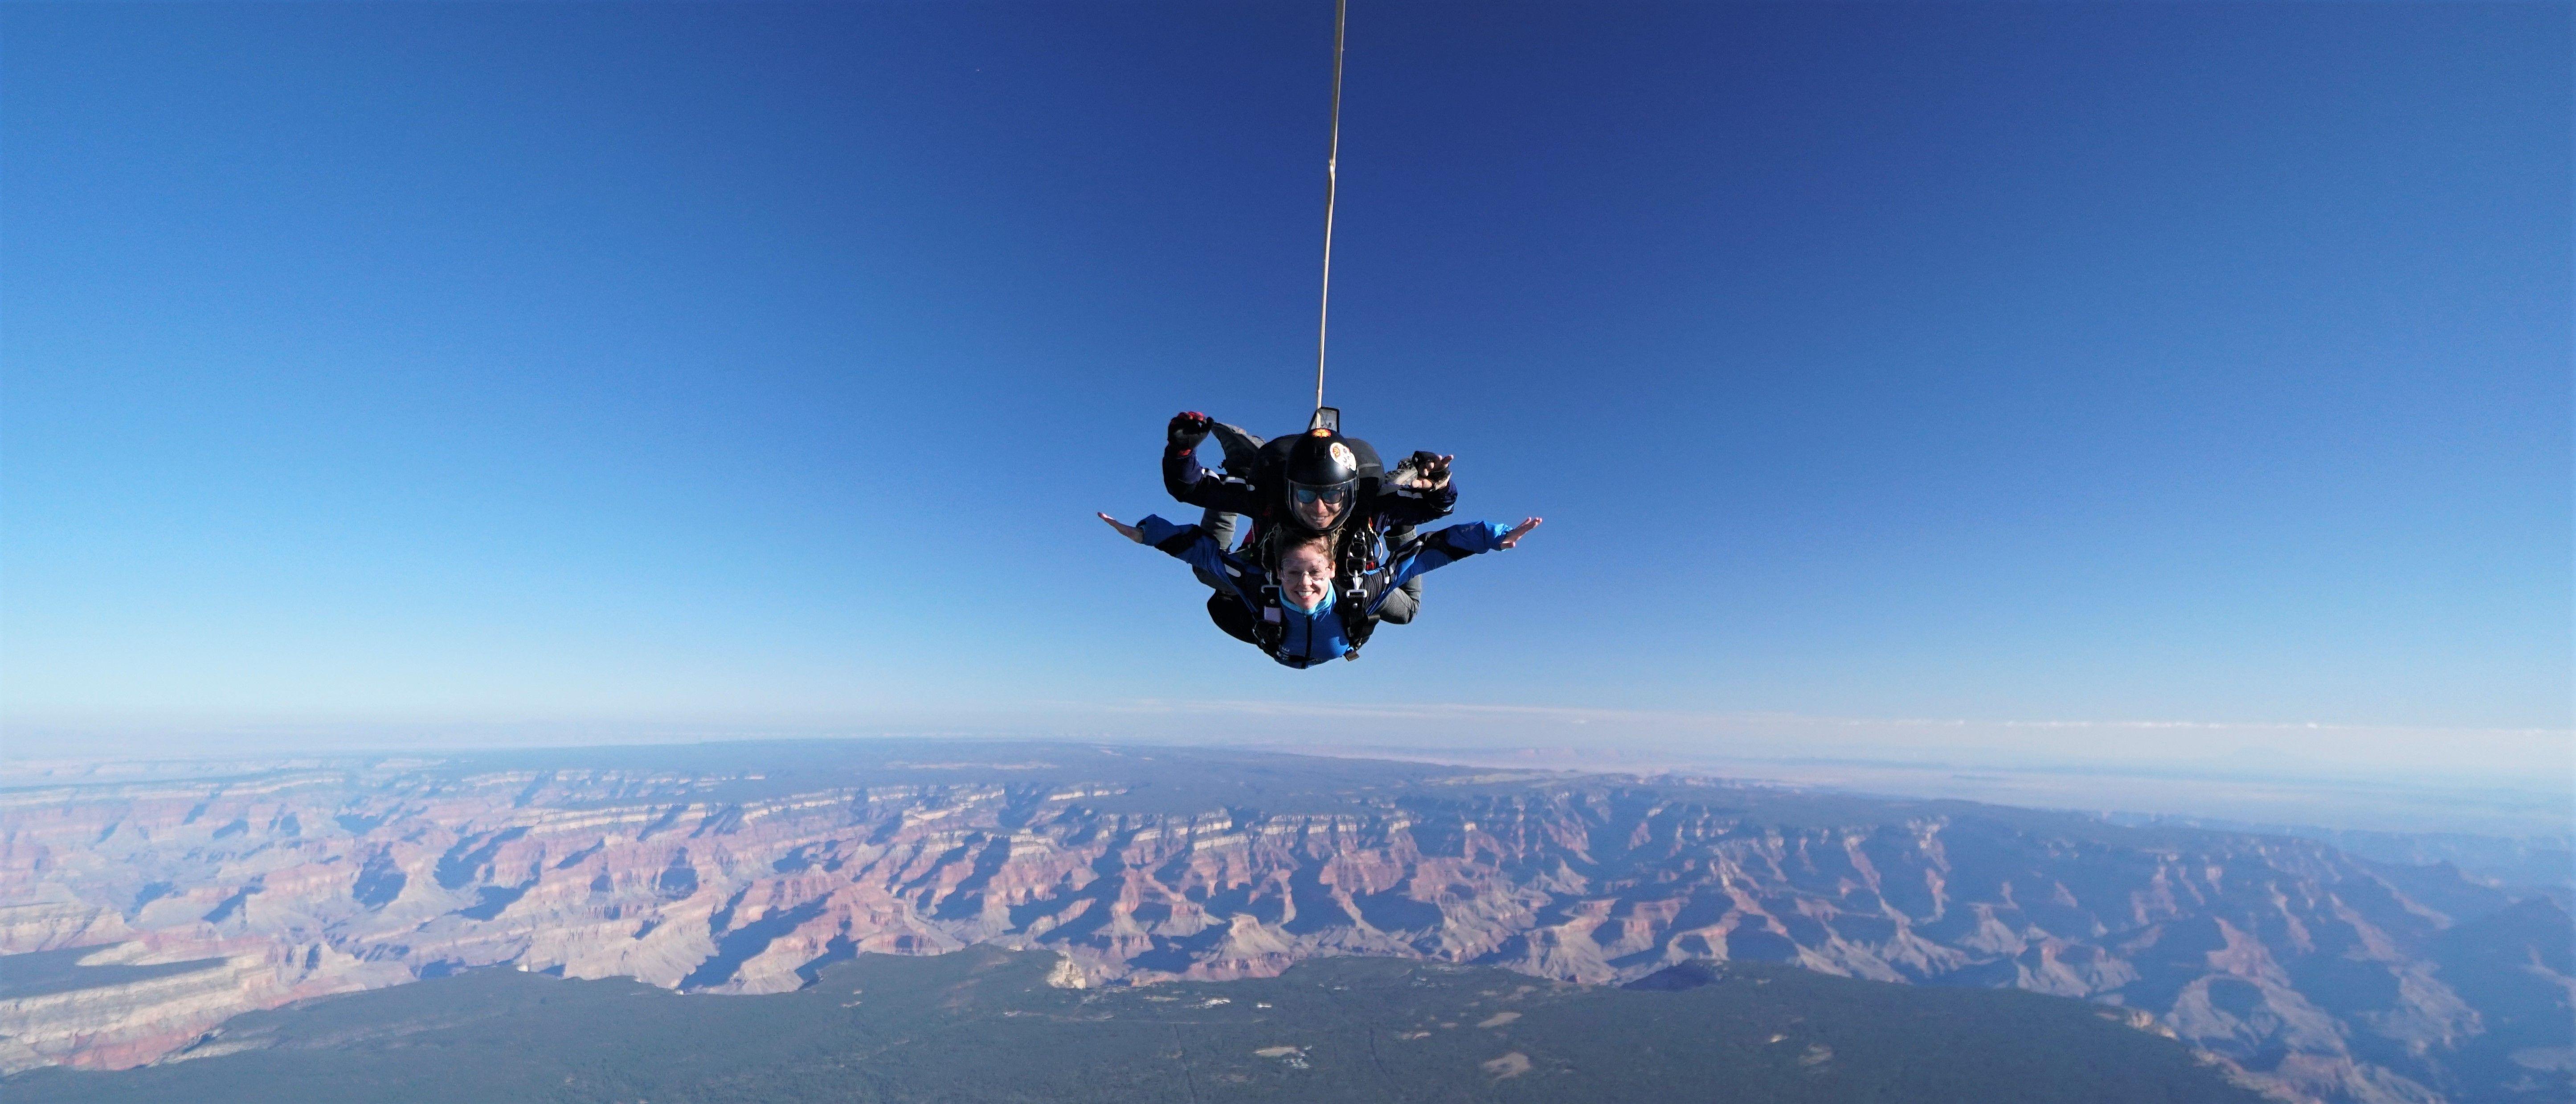 Skydive The Grand Canyon Skydive The Grand Canyon With Paragon Skydive Grand Canyon National Park Grand Canyon South Grand Canyon